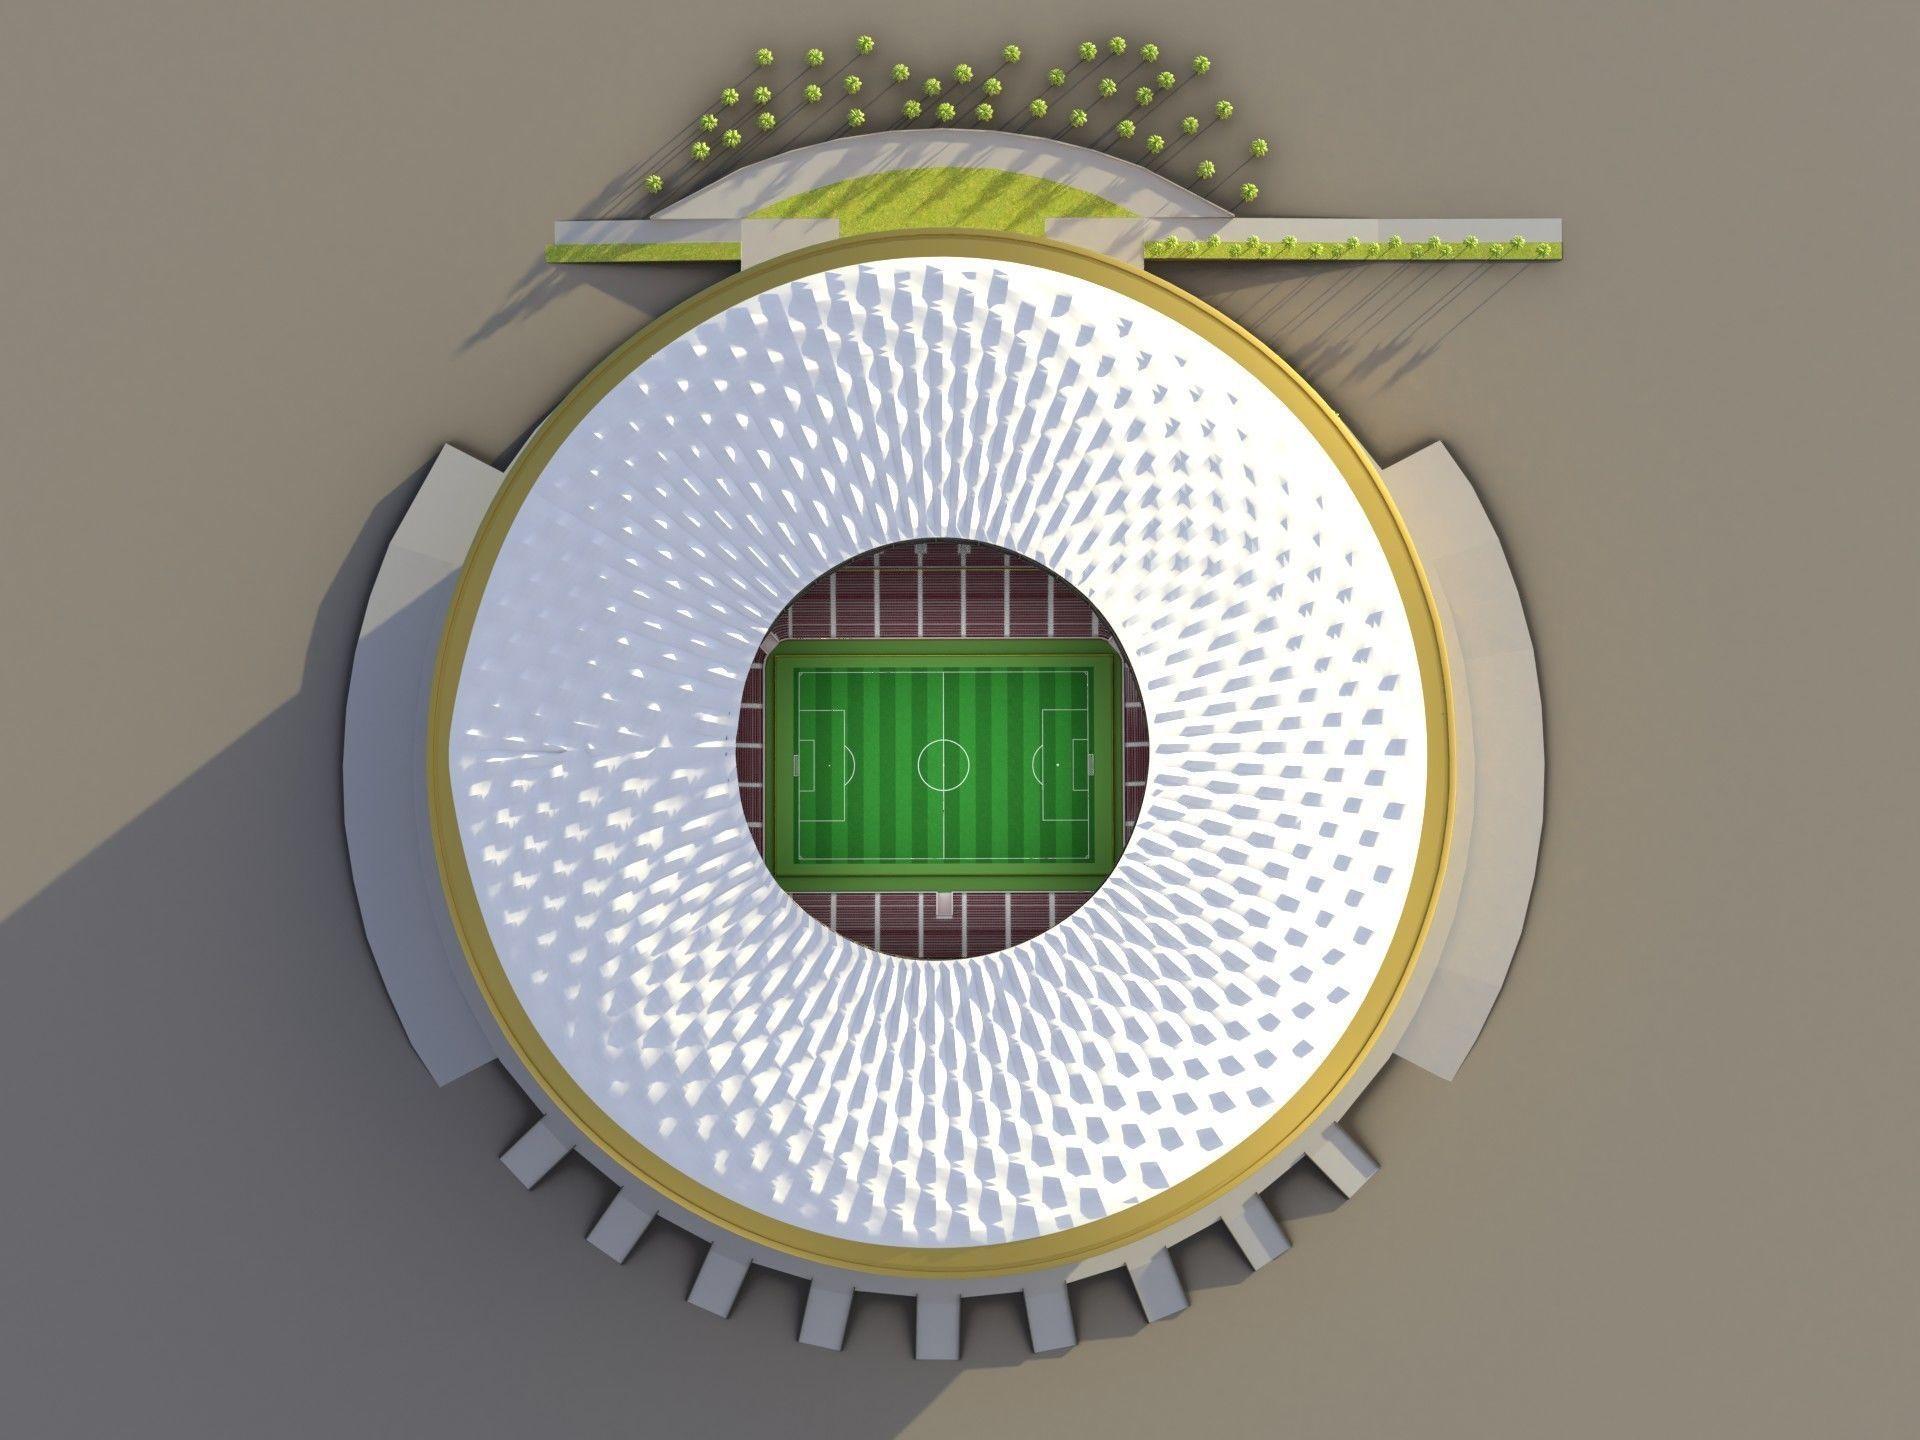 Lusail Stadium Fifa World Cup 2022 Qatar 3d Sport In 2020 World Cup 2022 Fifa World Cup Qatar World Cup Stadiums